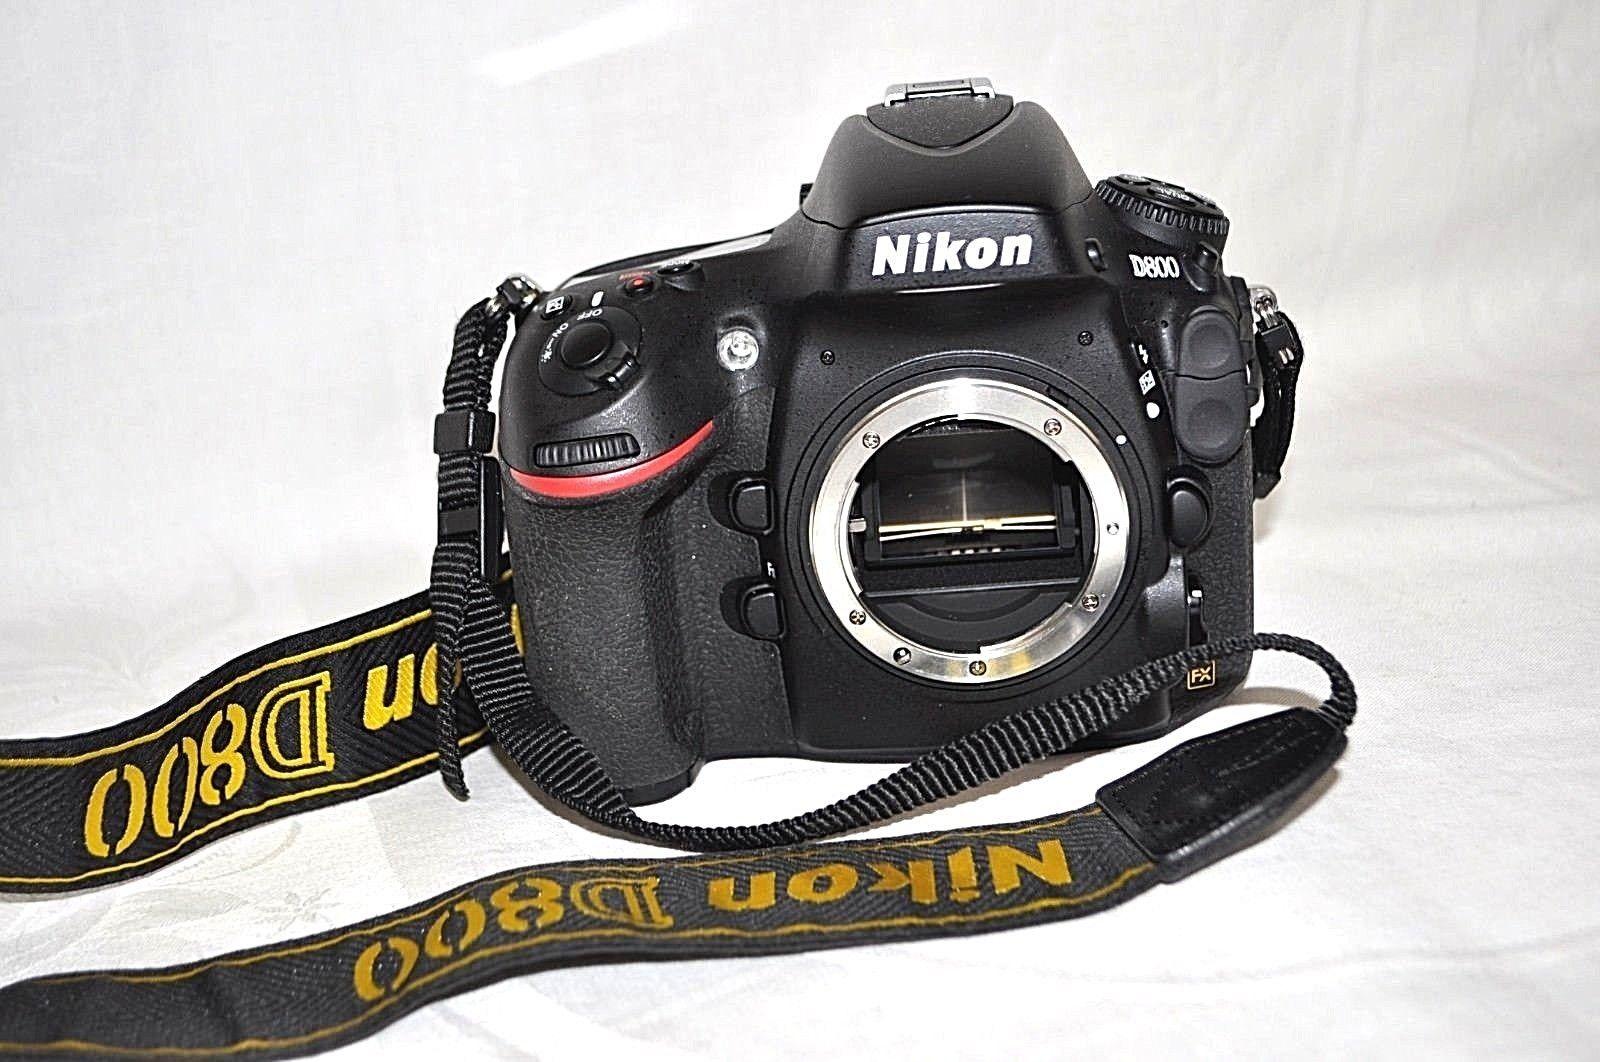 Nikon D D800 36.3 MP SLR-Digitalkamera - Schwarz (Nur Gehäuse)